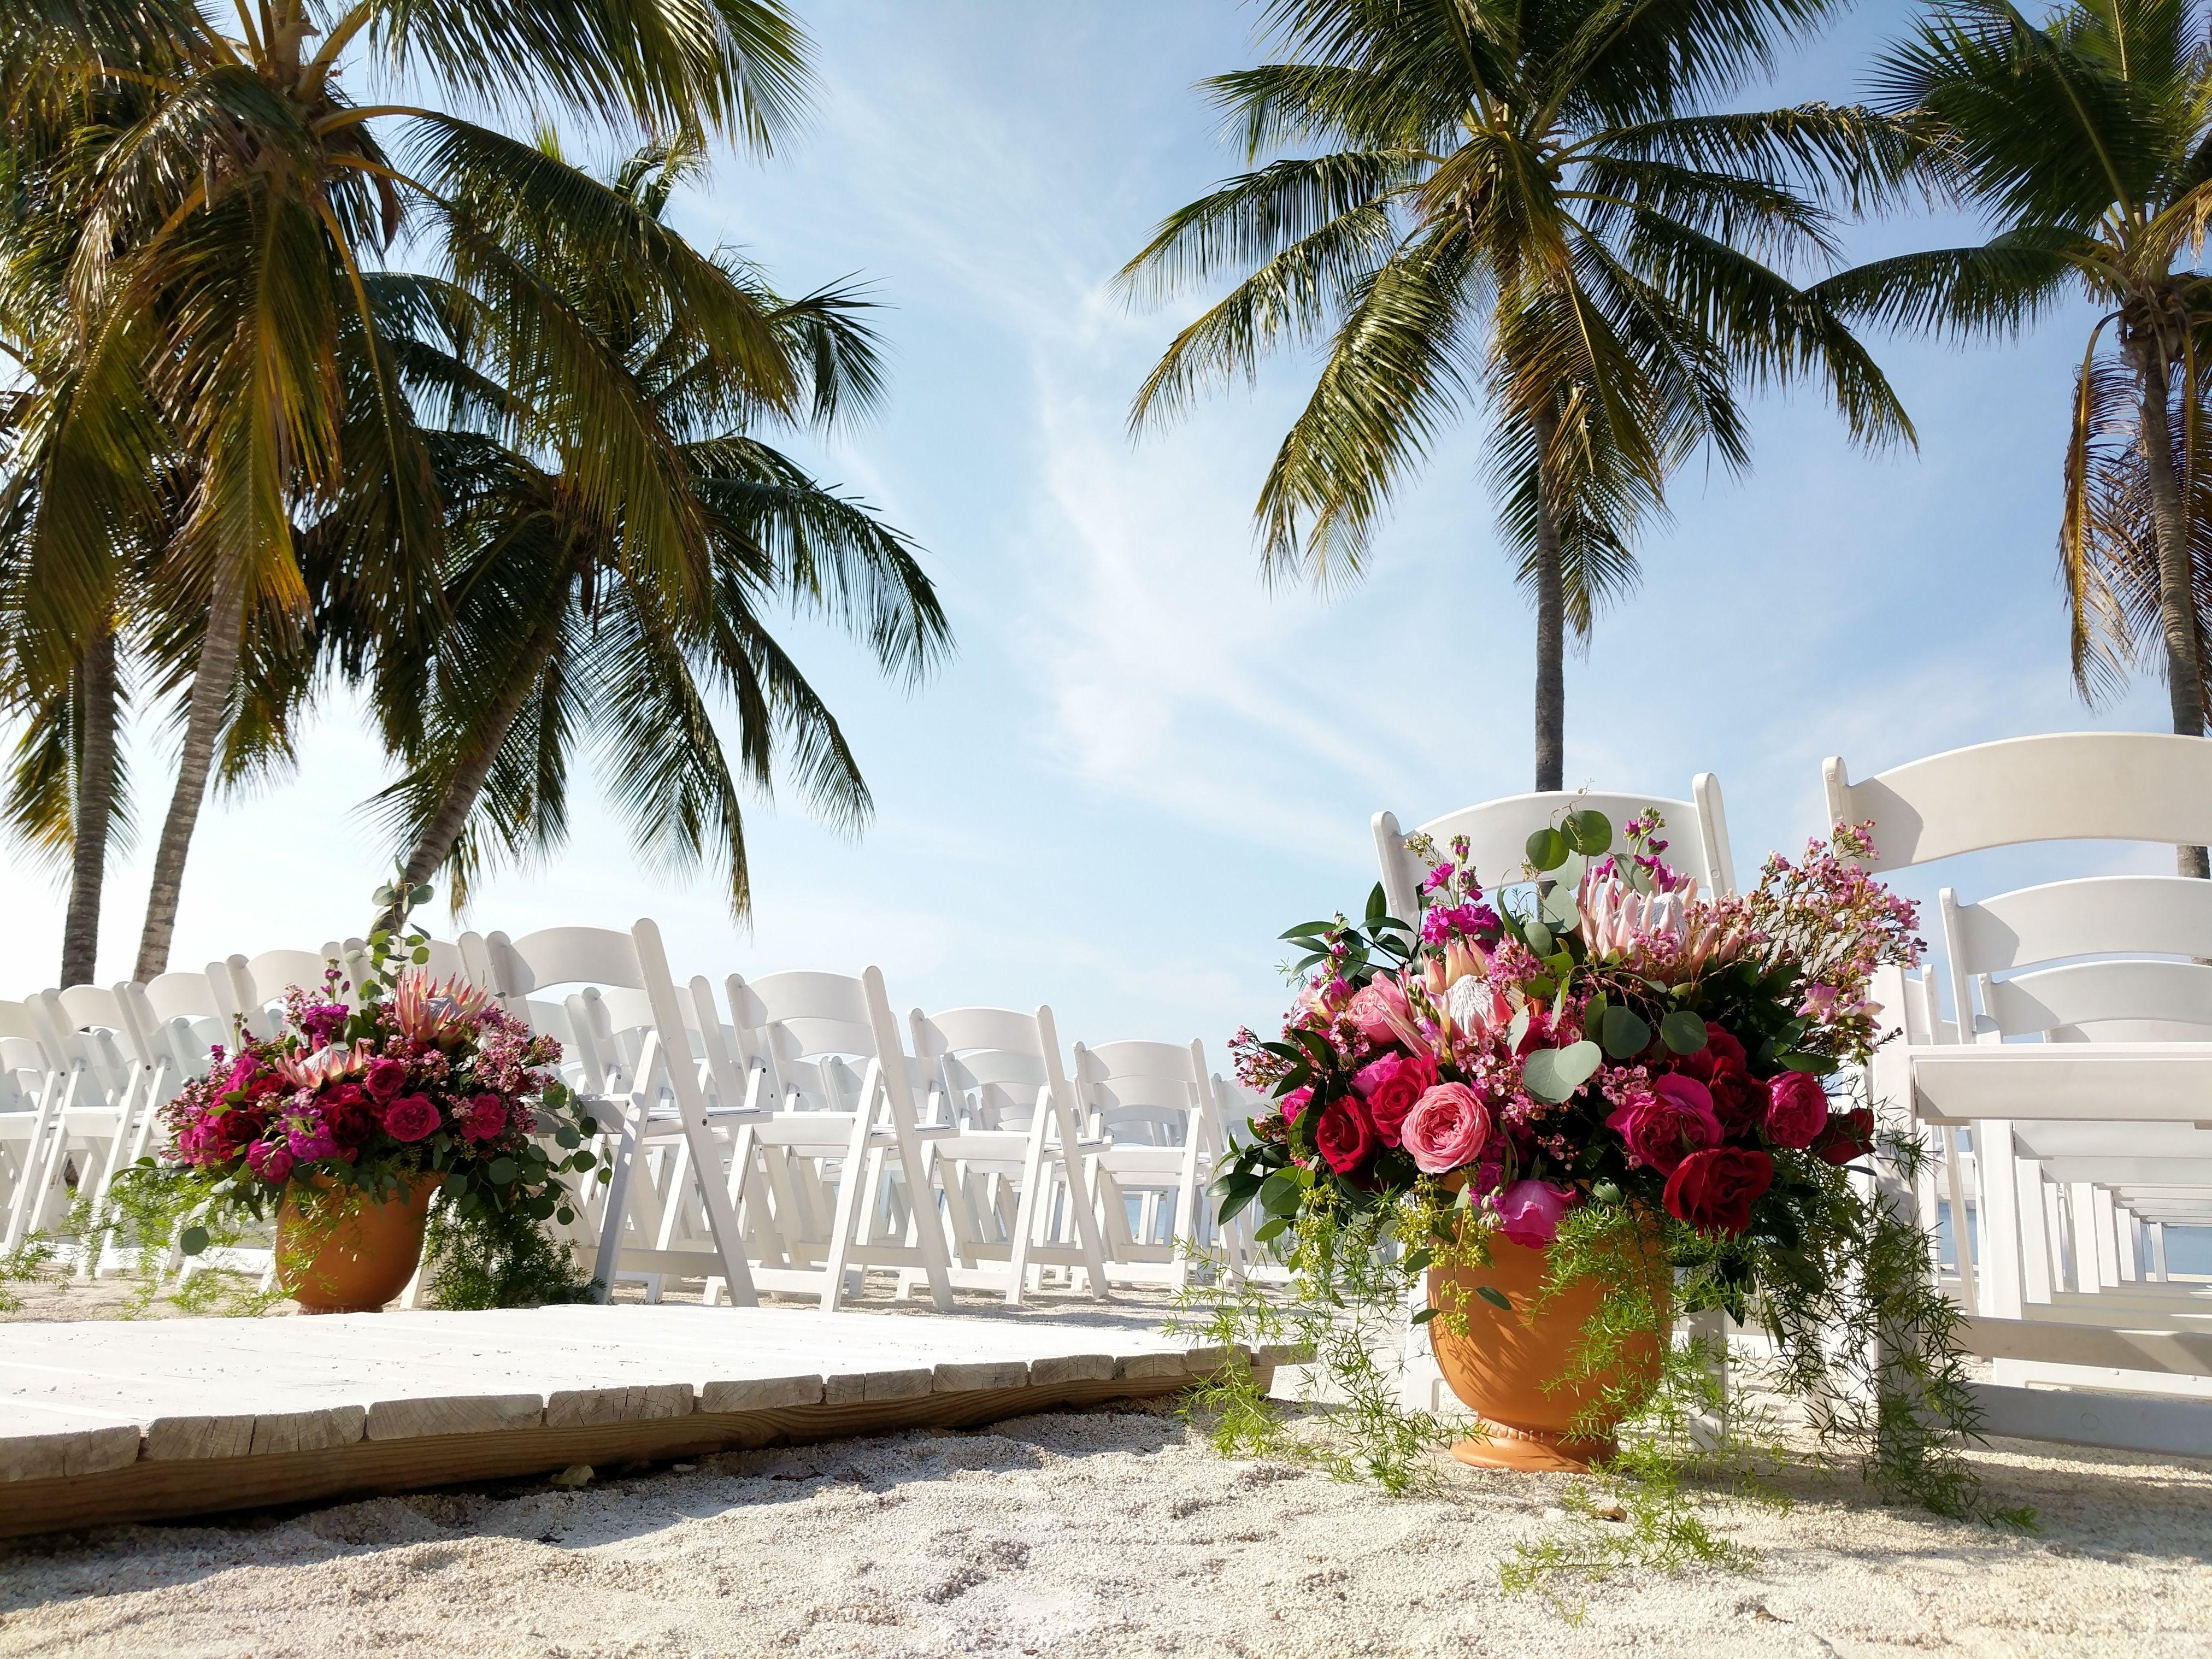 Florida Destination Weddings, Private Beach Weddings in